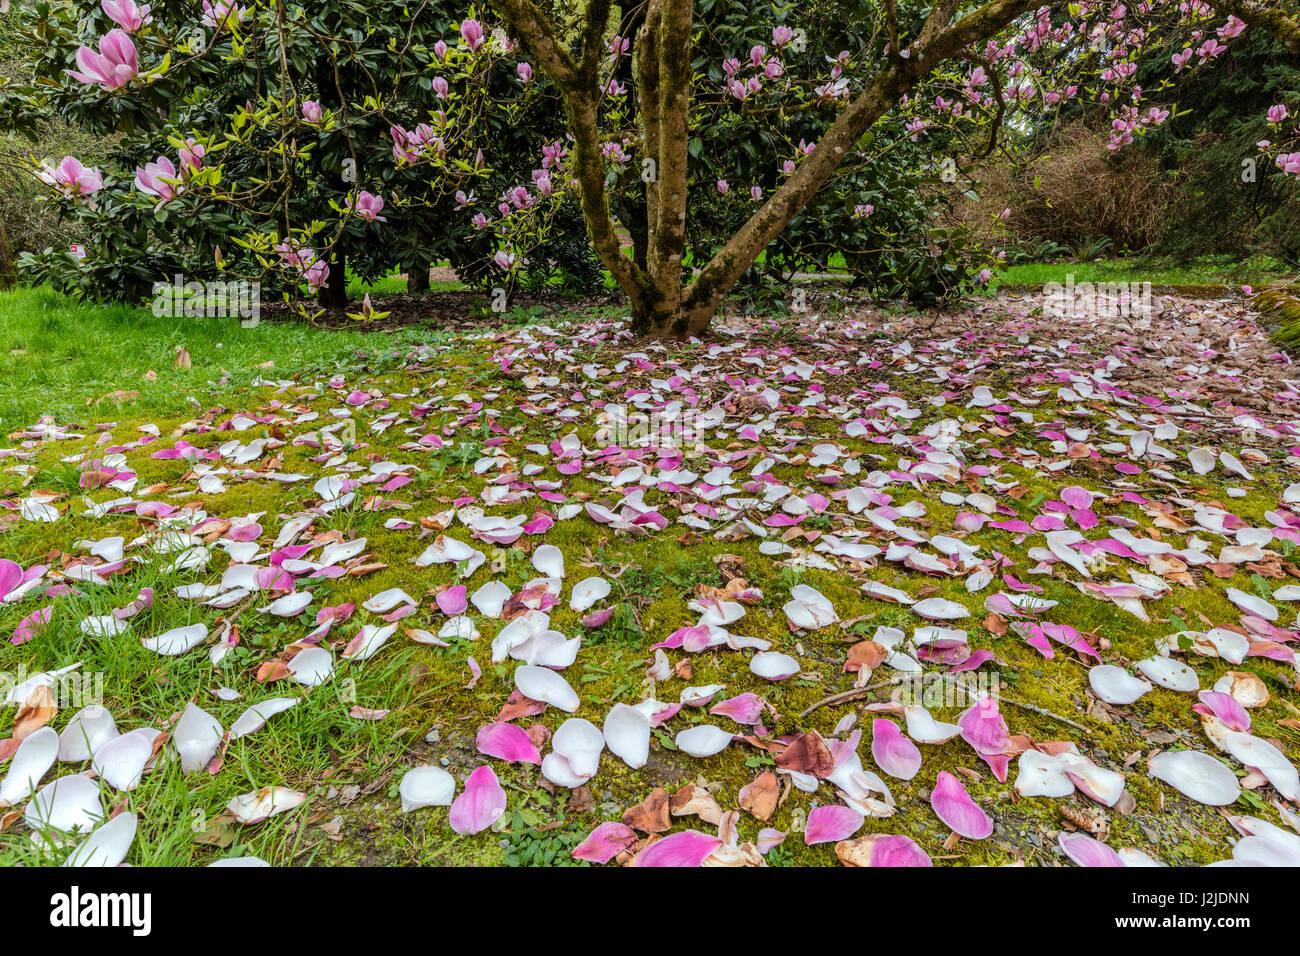 Magnolia Trees Flowering In Spring At The Arboretum In Seattle Stock